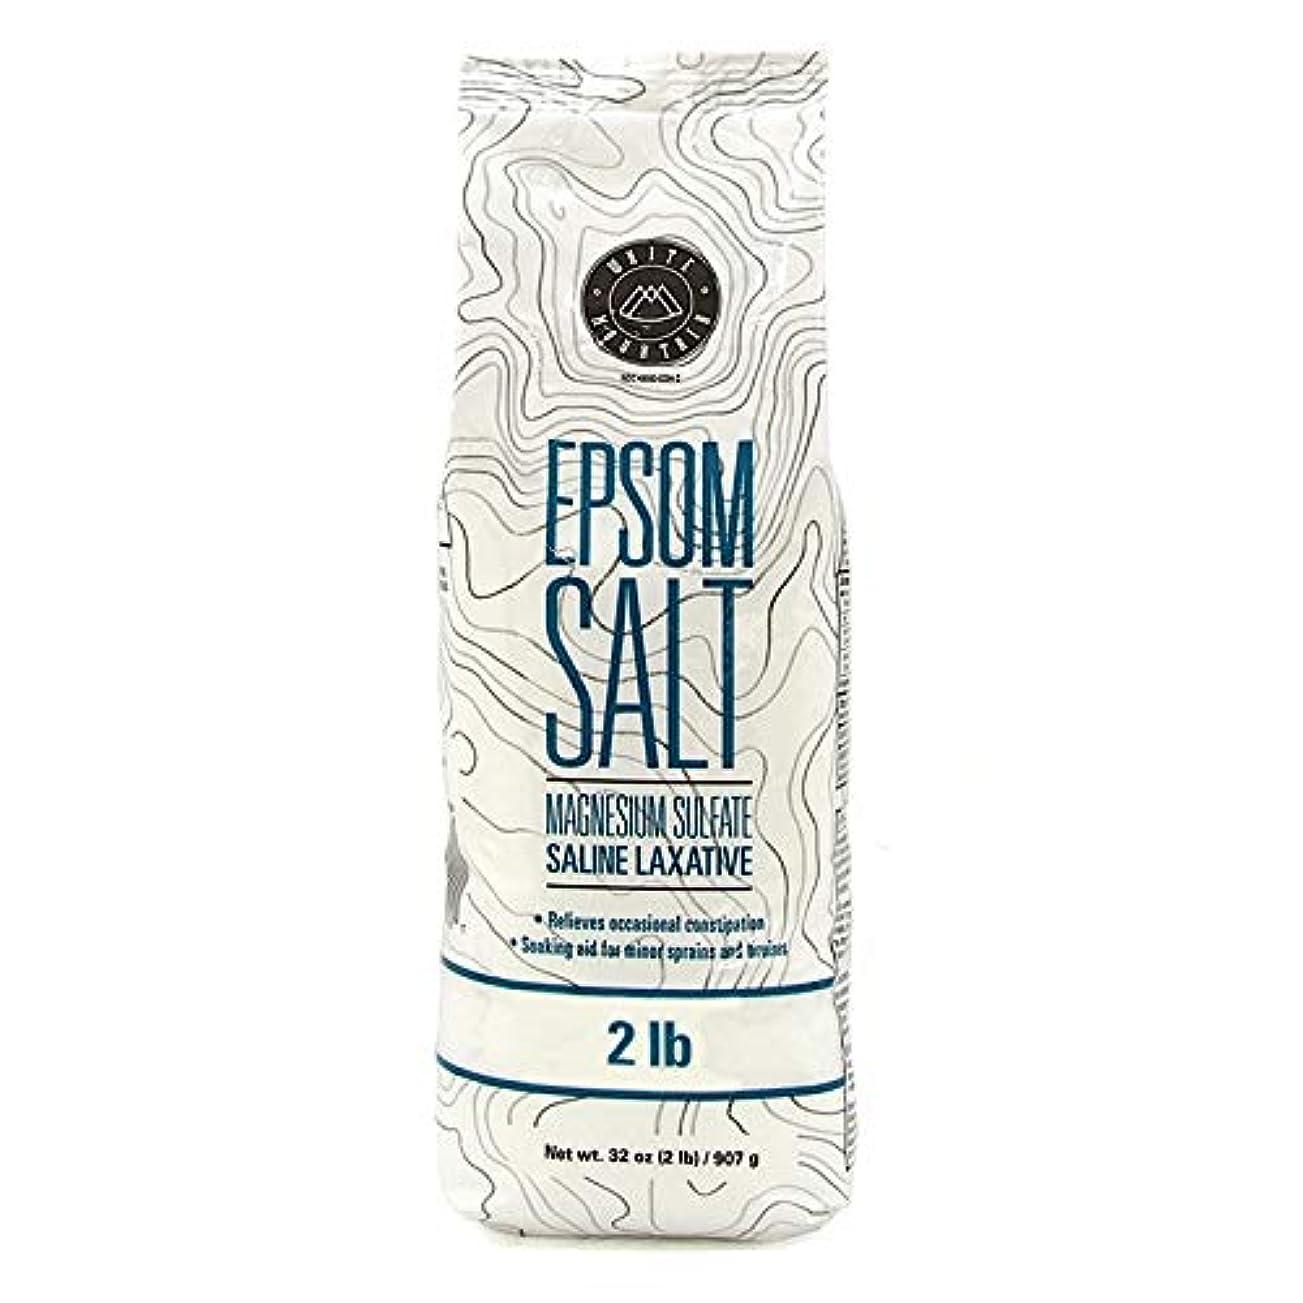 Epsom Salt エプソムソルト / 100% Natural Mineral / エプソム塩 / マグネシウム入浴剤 / 無色?無臭